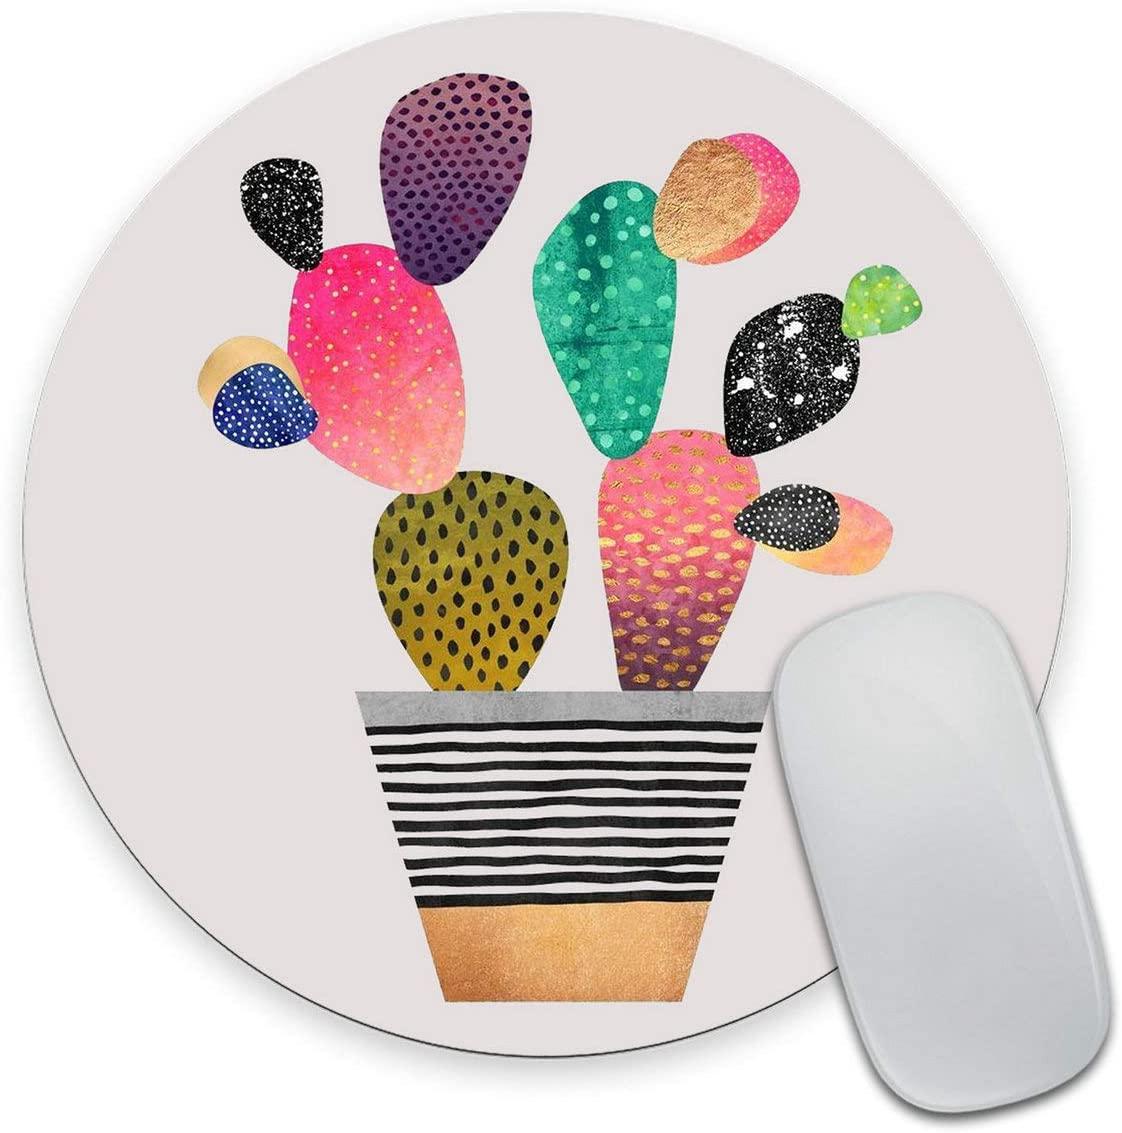 Smooffly Round Gaming Mouse Pad Custom Design, Watercolor Cactus Circular Non-Slip Rubber Mousepad